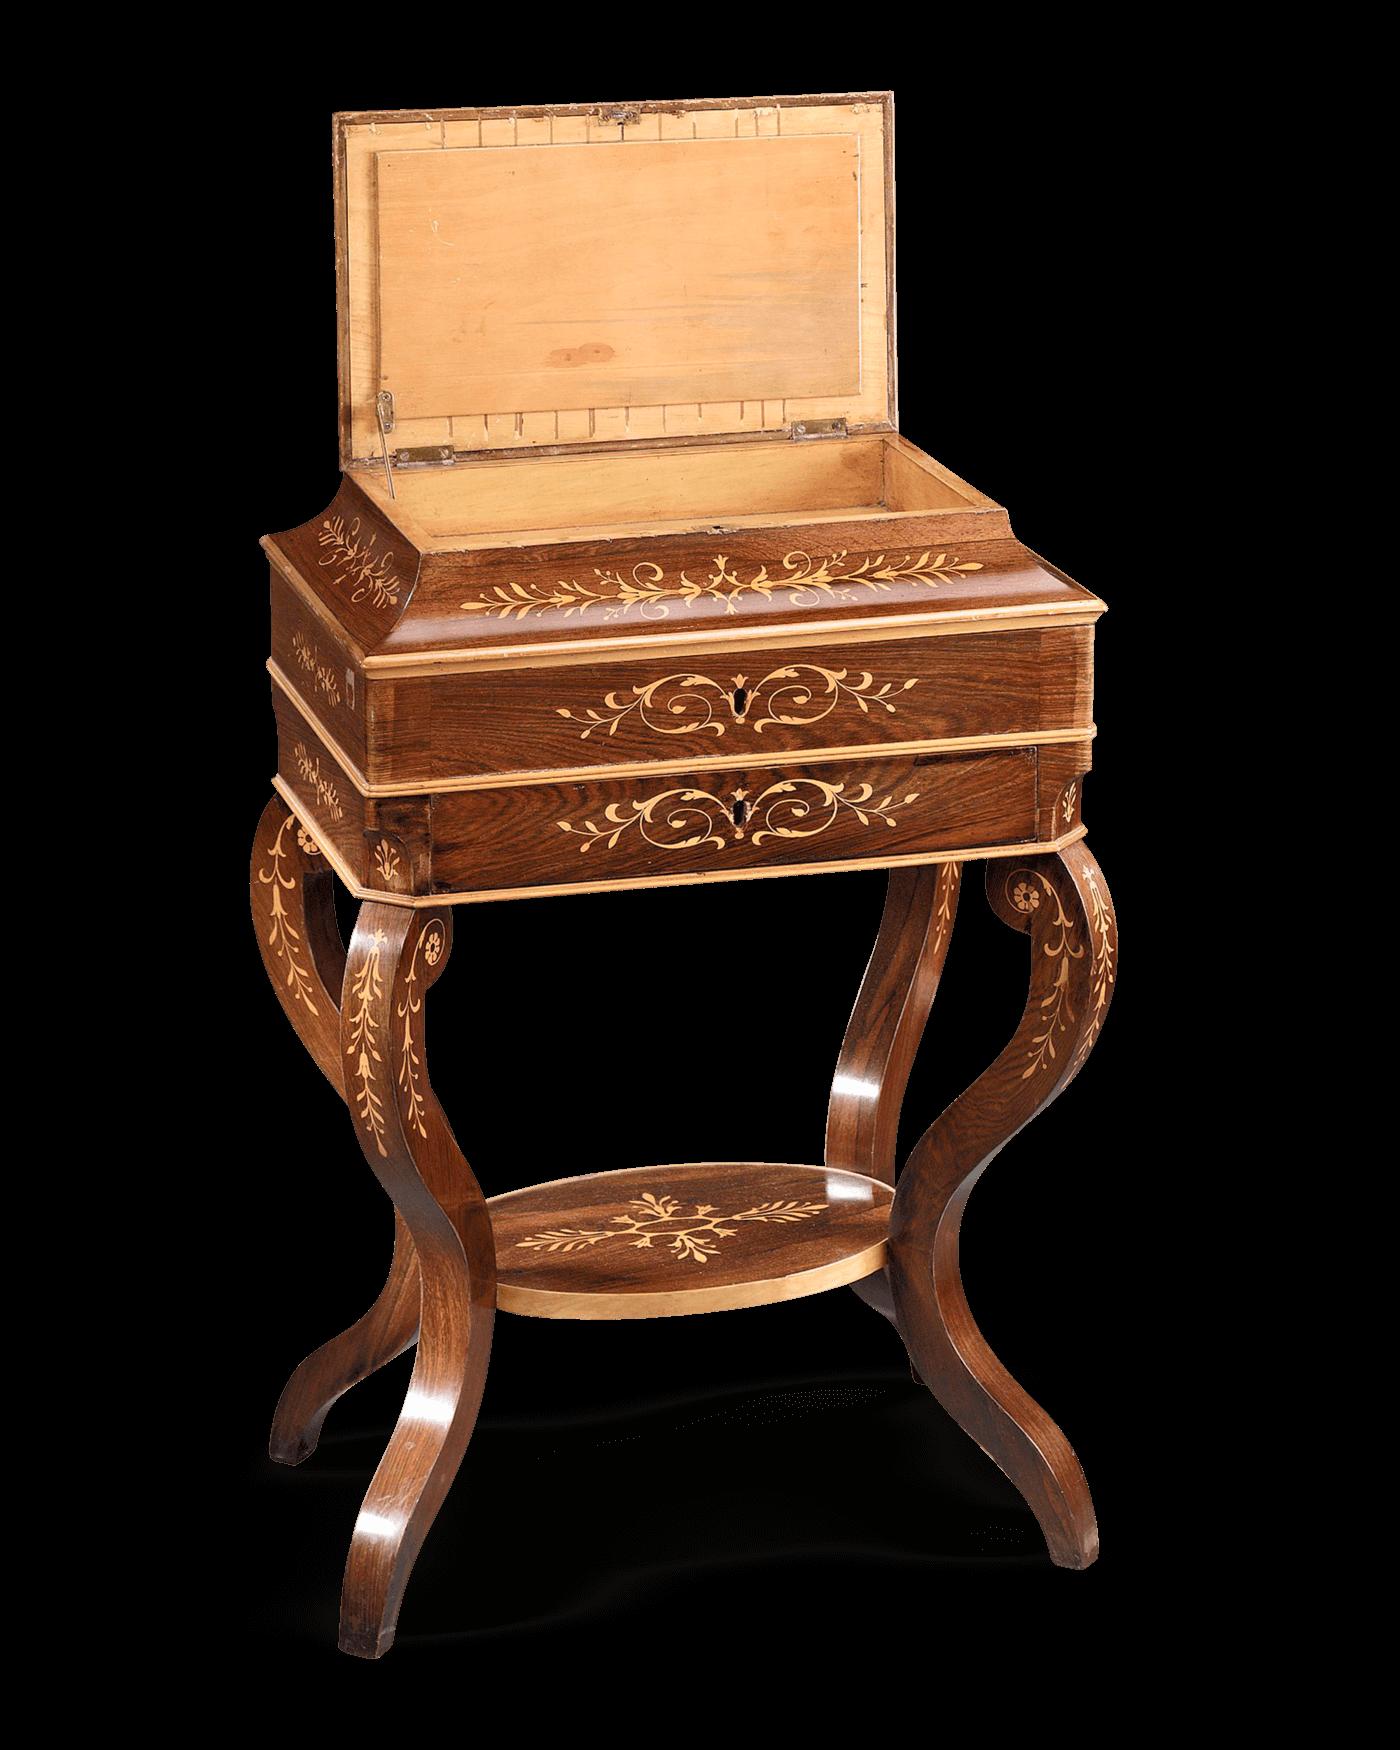 Antique Furniture, Charles X Furniture, Rosewood Furniture, Sewing Antiques  at rauantiques.com - Antique Furniture, Charles X Furniture, Rosewood Furniture, Sewing